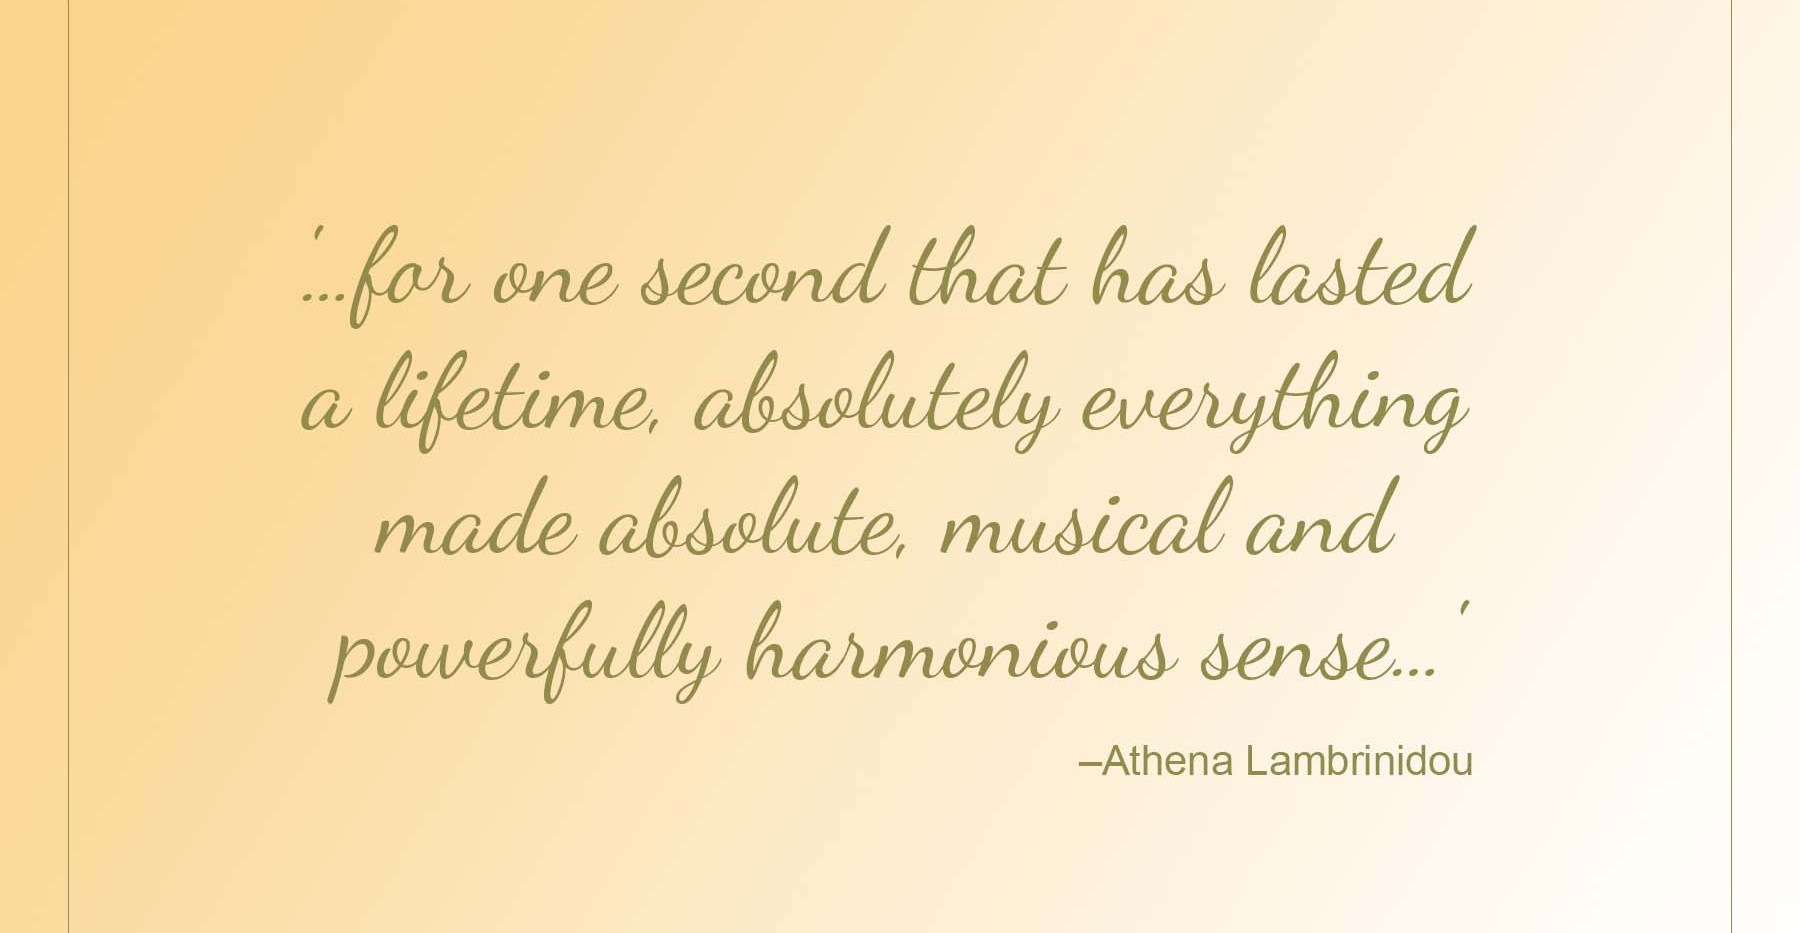 Sisters Quote - Athena Lambrinidou